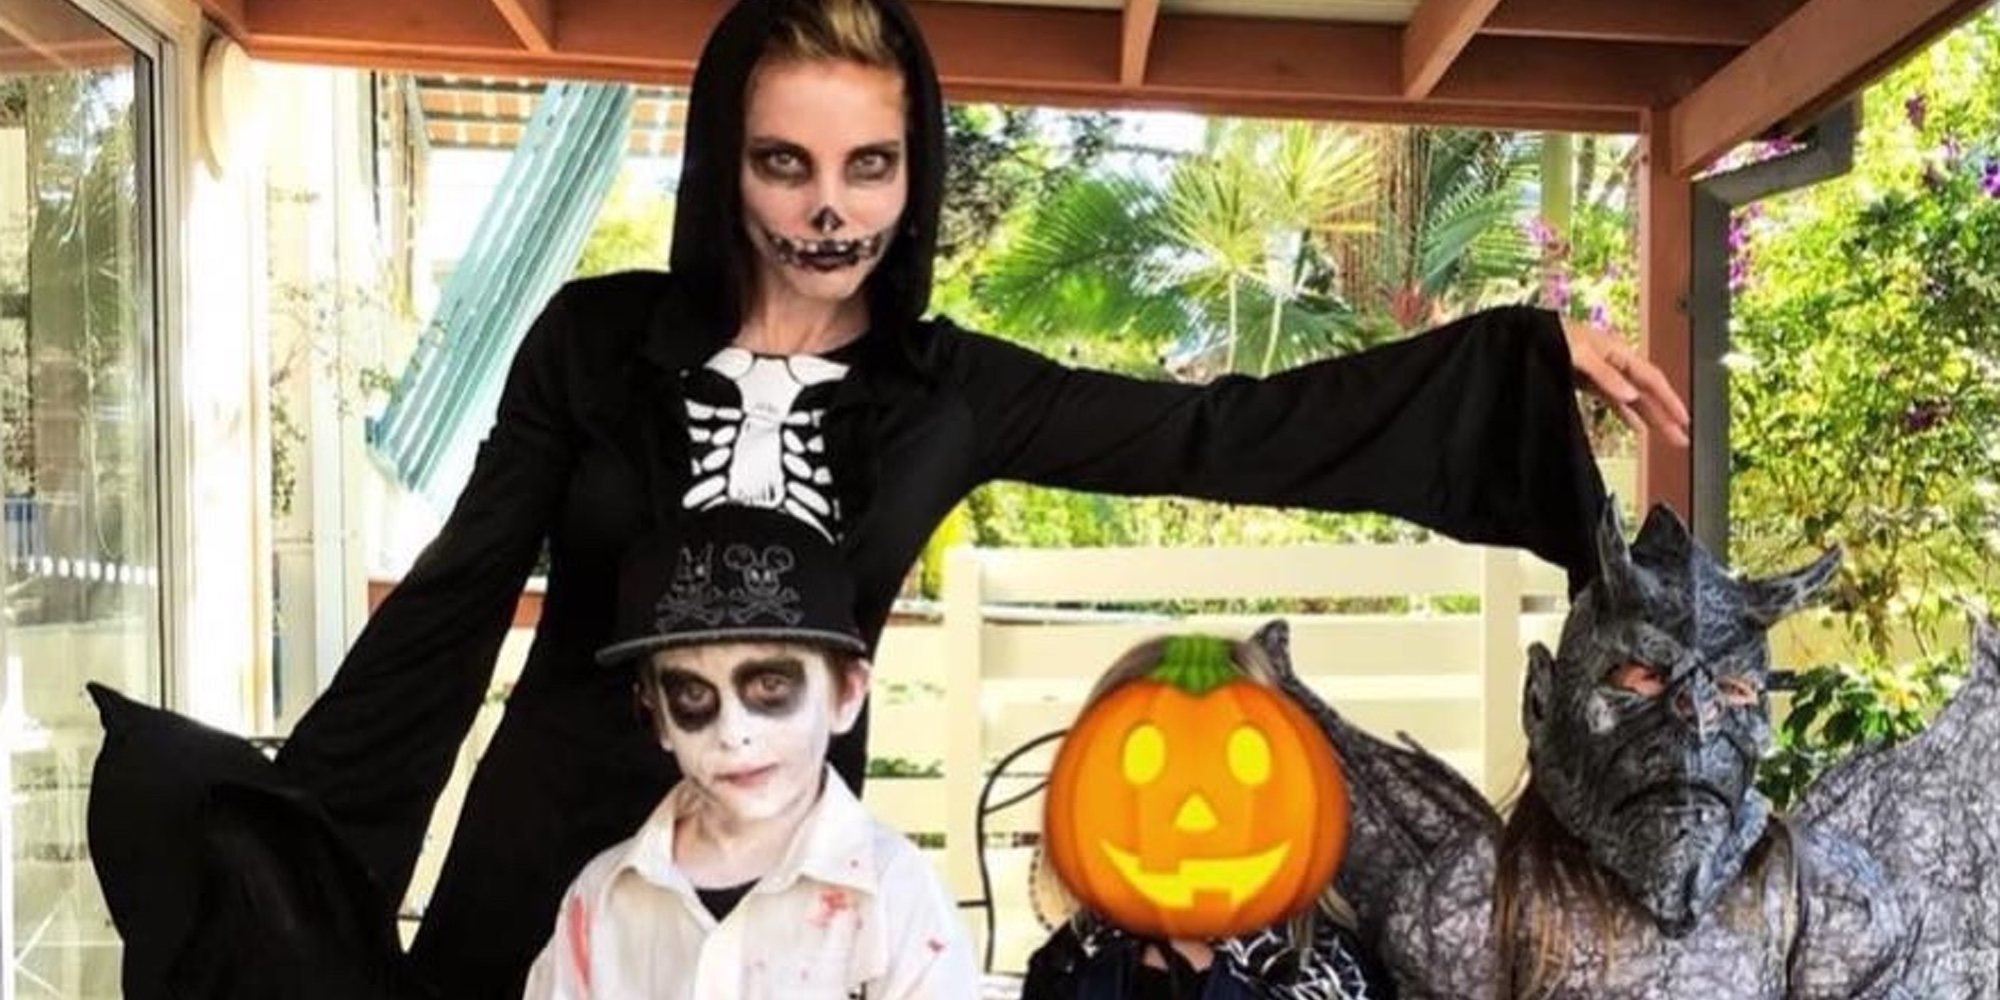 Adriana Abenia, Elsa Pataky y Alejandra Rubio se preparan para celebrar Halloween 2018